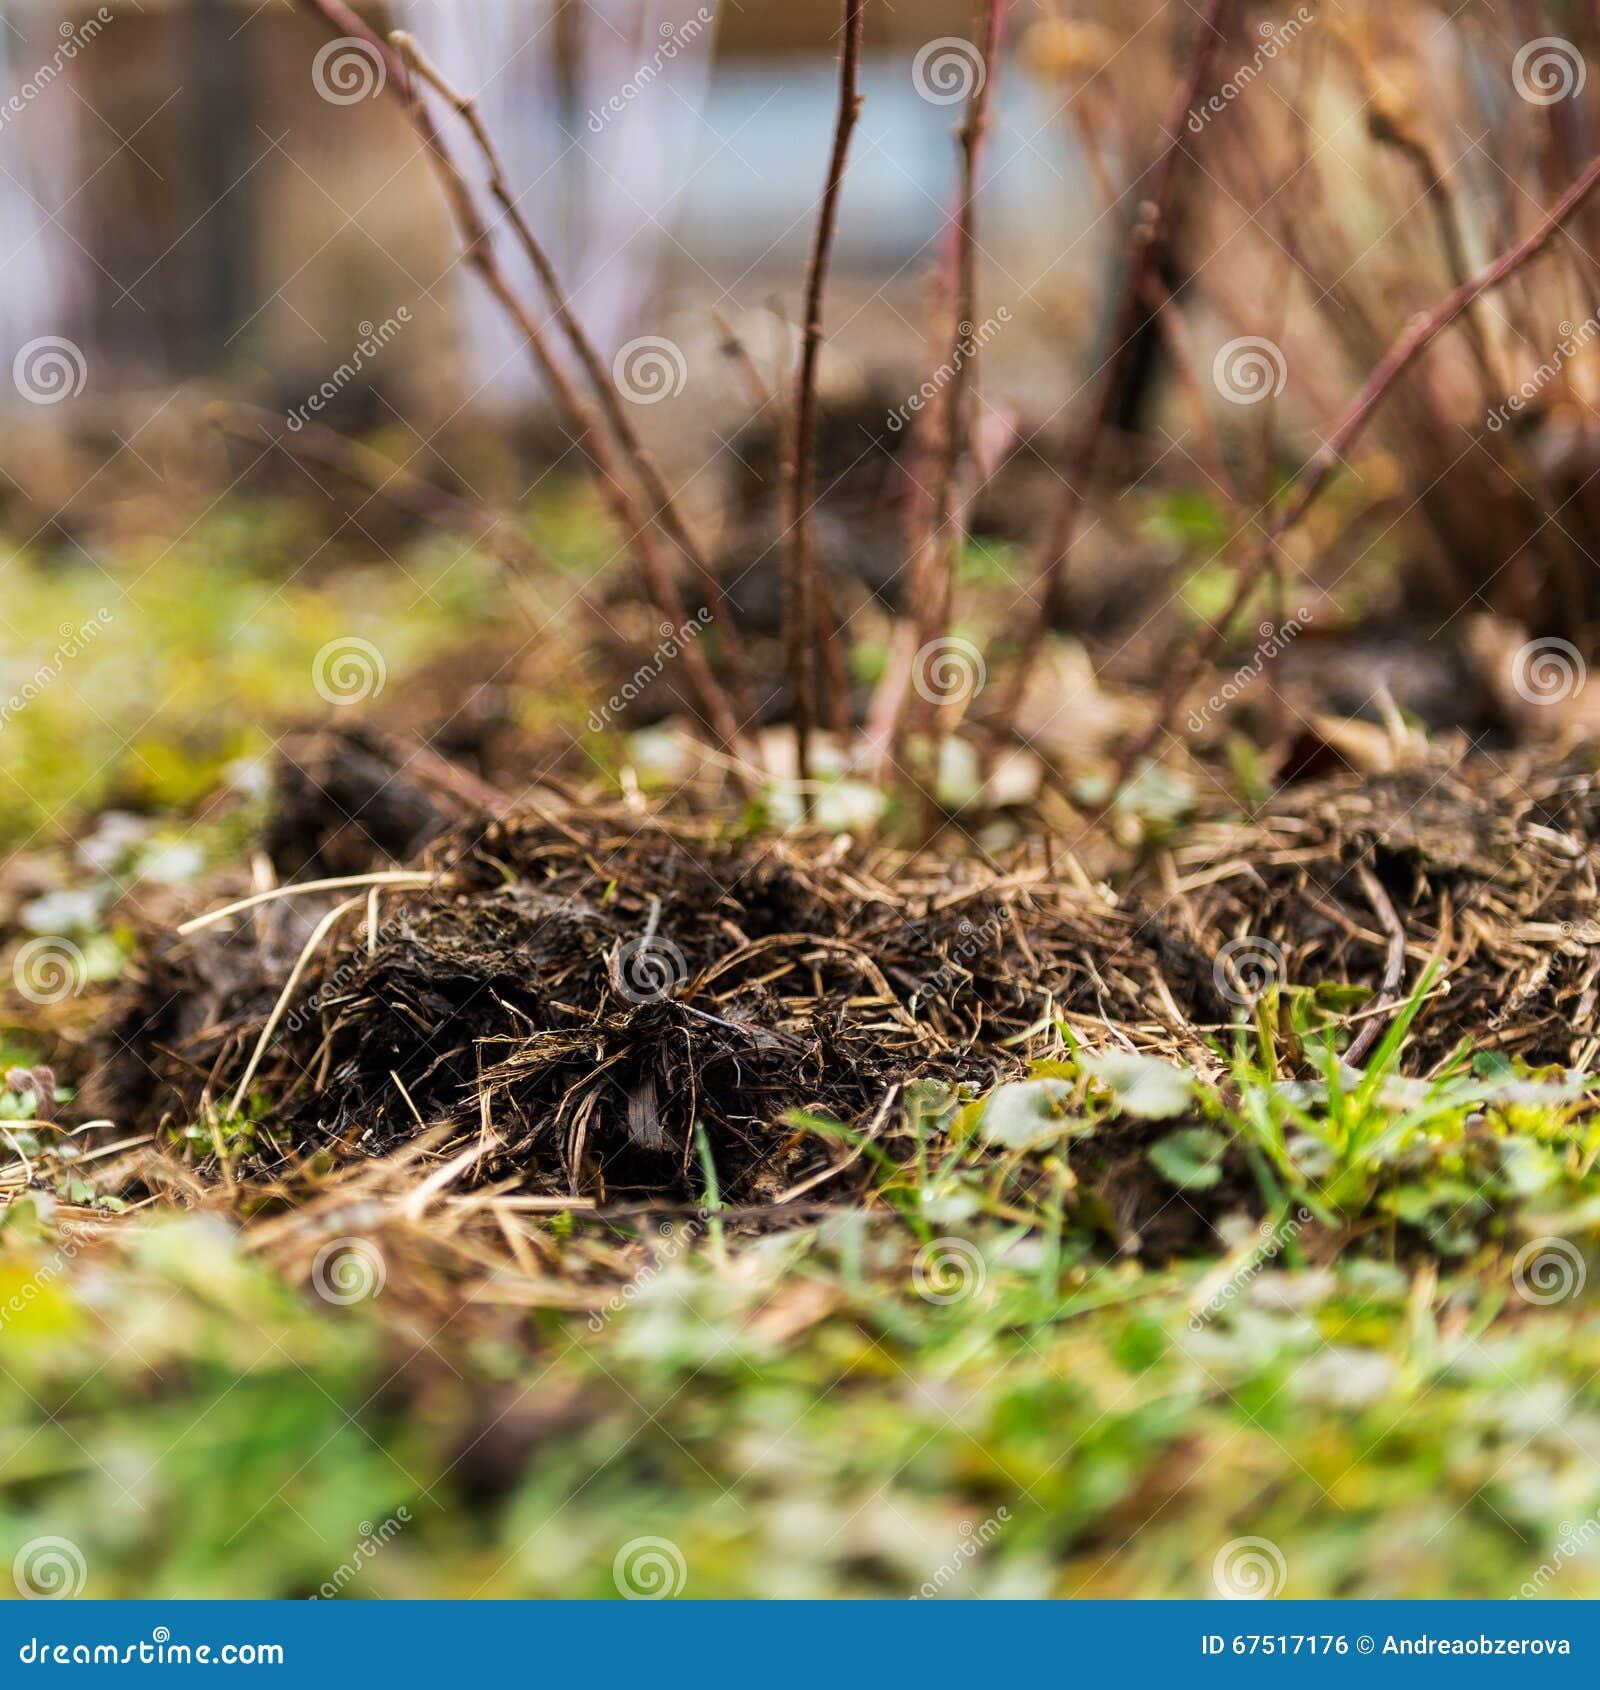 Fertilizing Manure Around Blackberries Plants Stock Photo - Image of ...